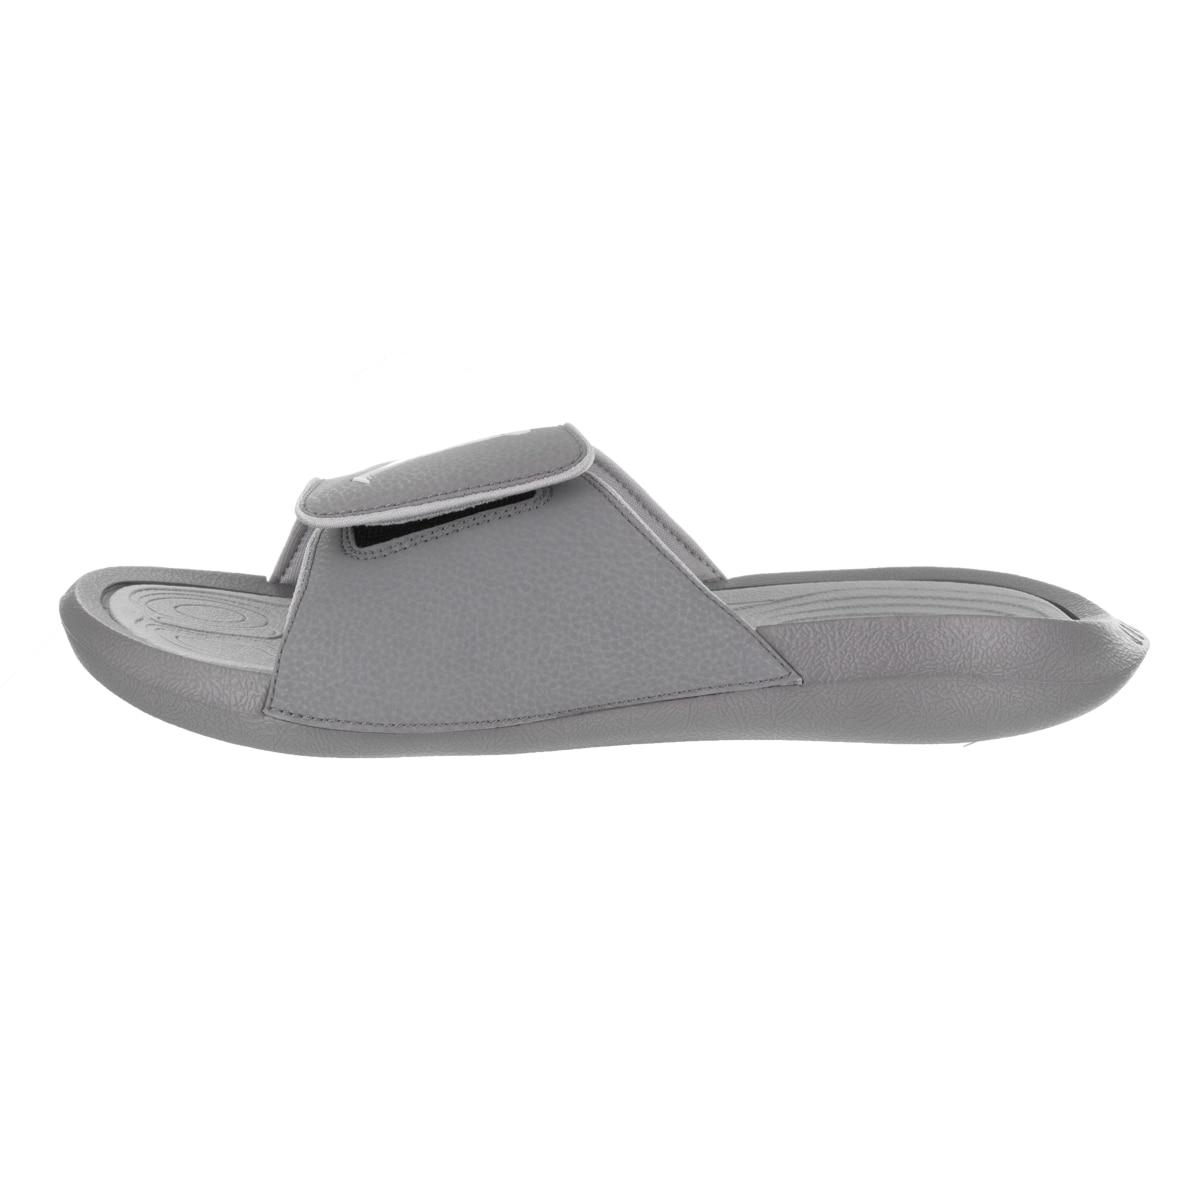 timeless design 97efd e804a Shop Nike Jordan Men s Jordan Hydro 6 Sandal 10 Men US - Free Shipping  Today - Overstock - 15858498